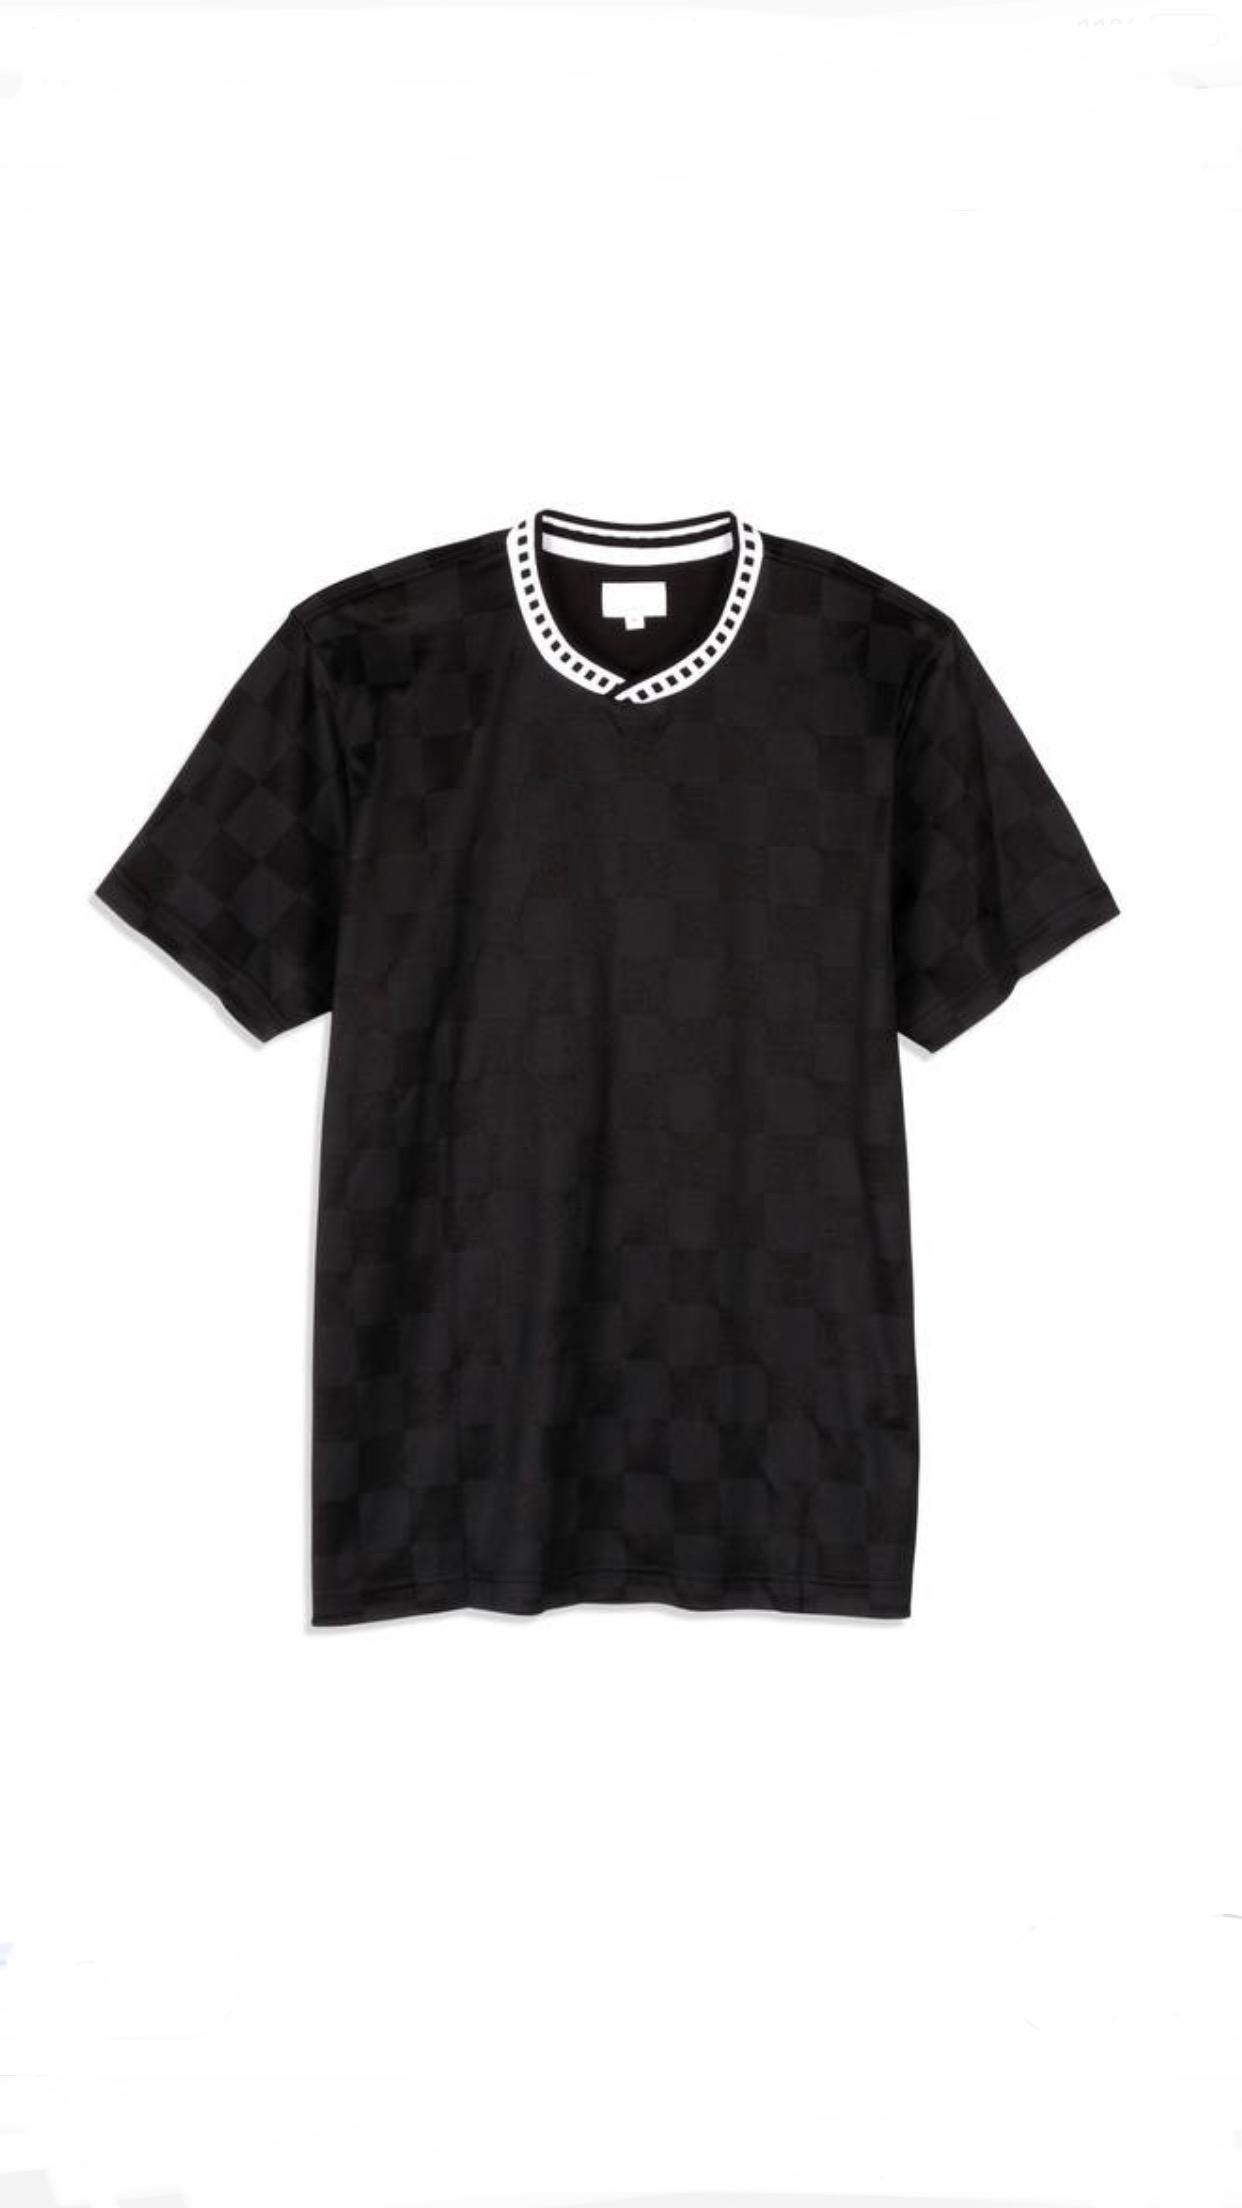 Lyst - Supreme Checker Soccer Jersey Black in Black for Men aaedd002d